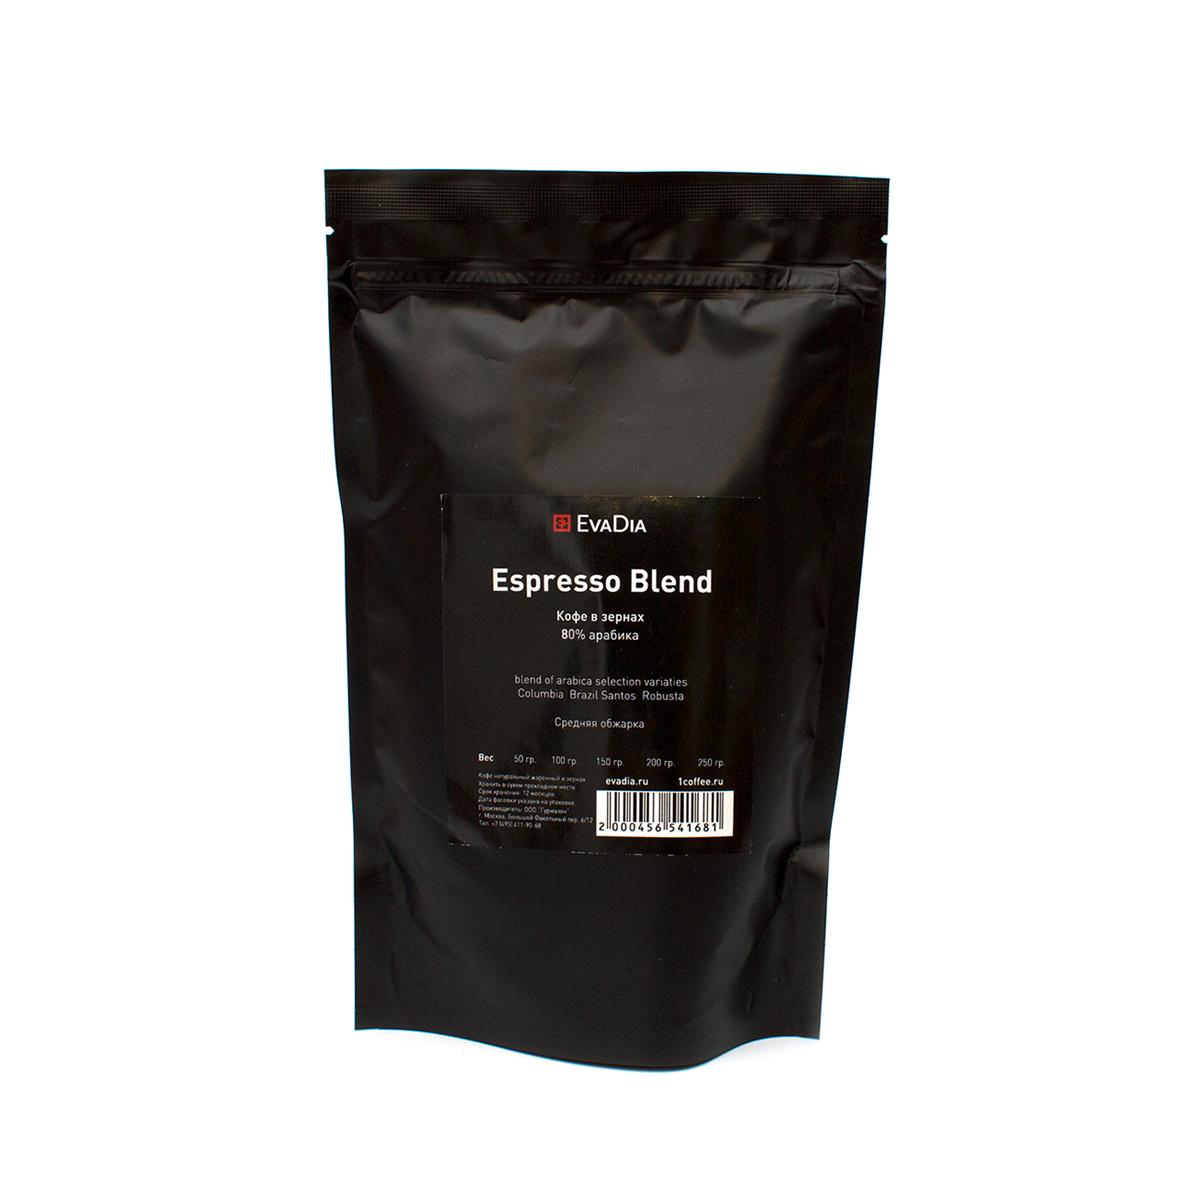 Кофе EvaDia «ESPRESSO BLEND», 80% арабика, medium roast, 250 грамм